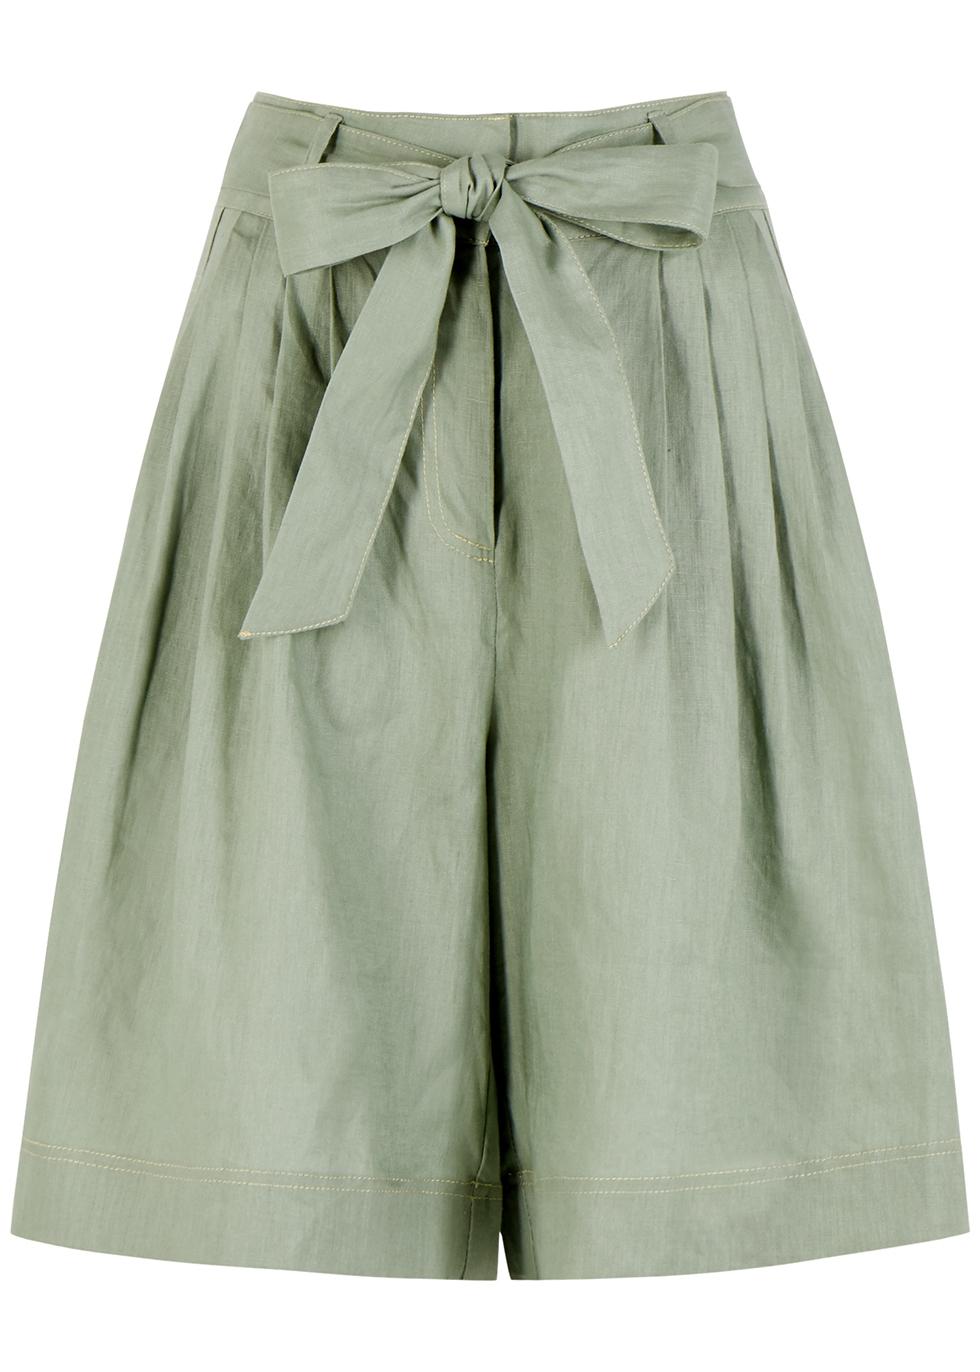 Ivy sage linen shorts